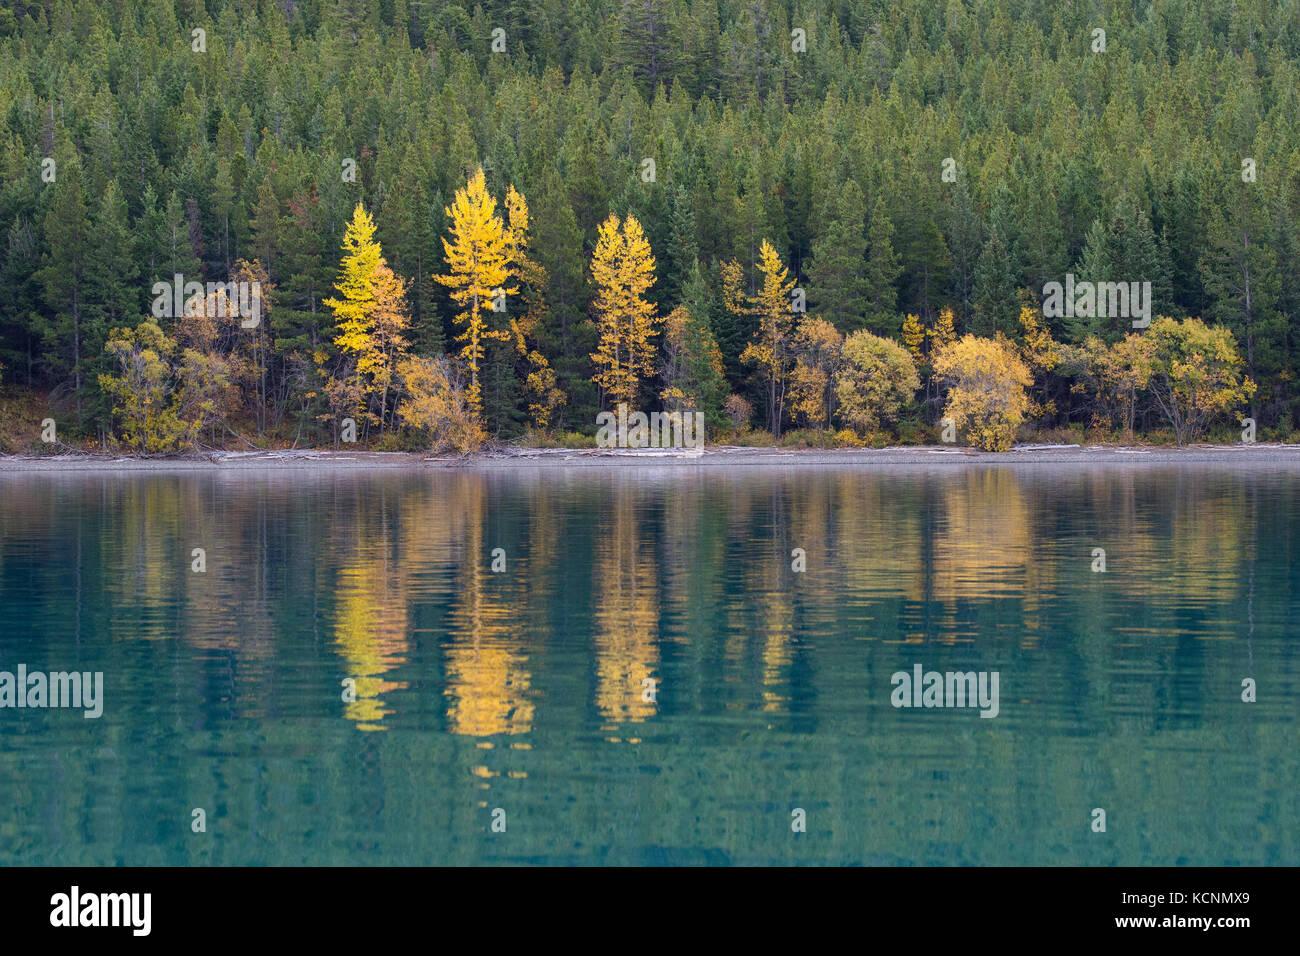 Fall colour, Chilcotin Region, British Columbia, Canada - Stock Image